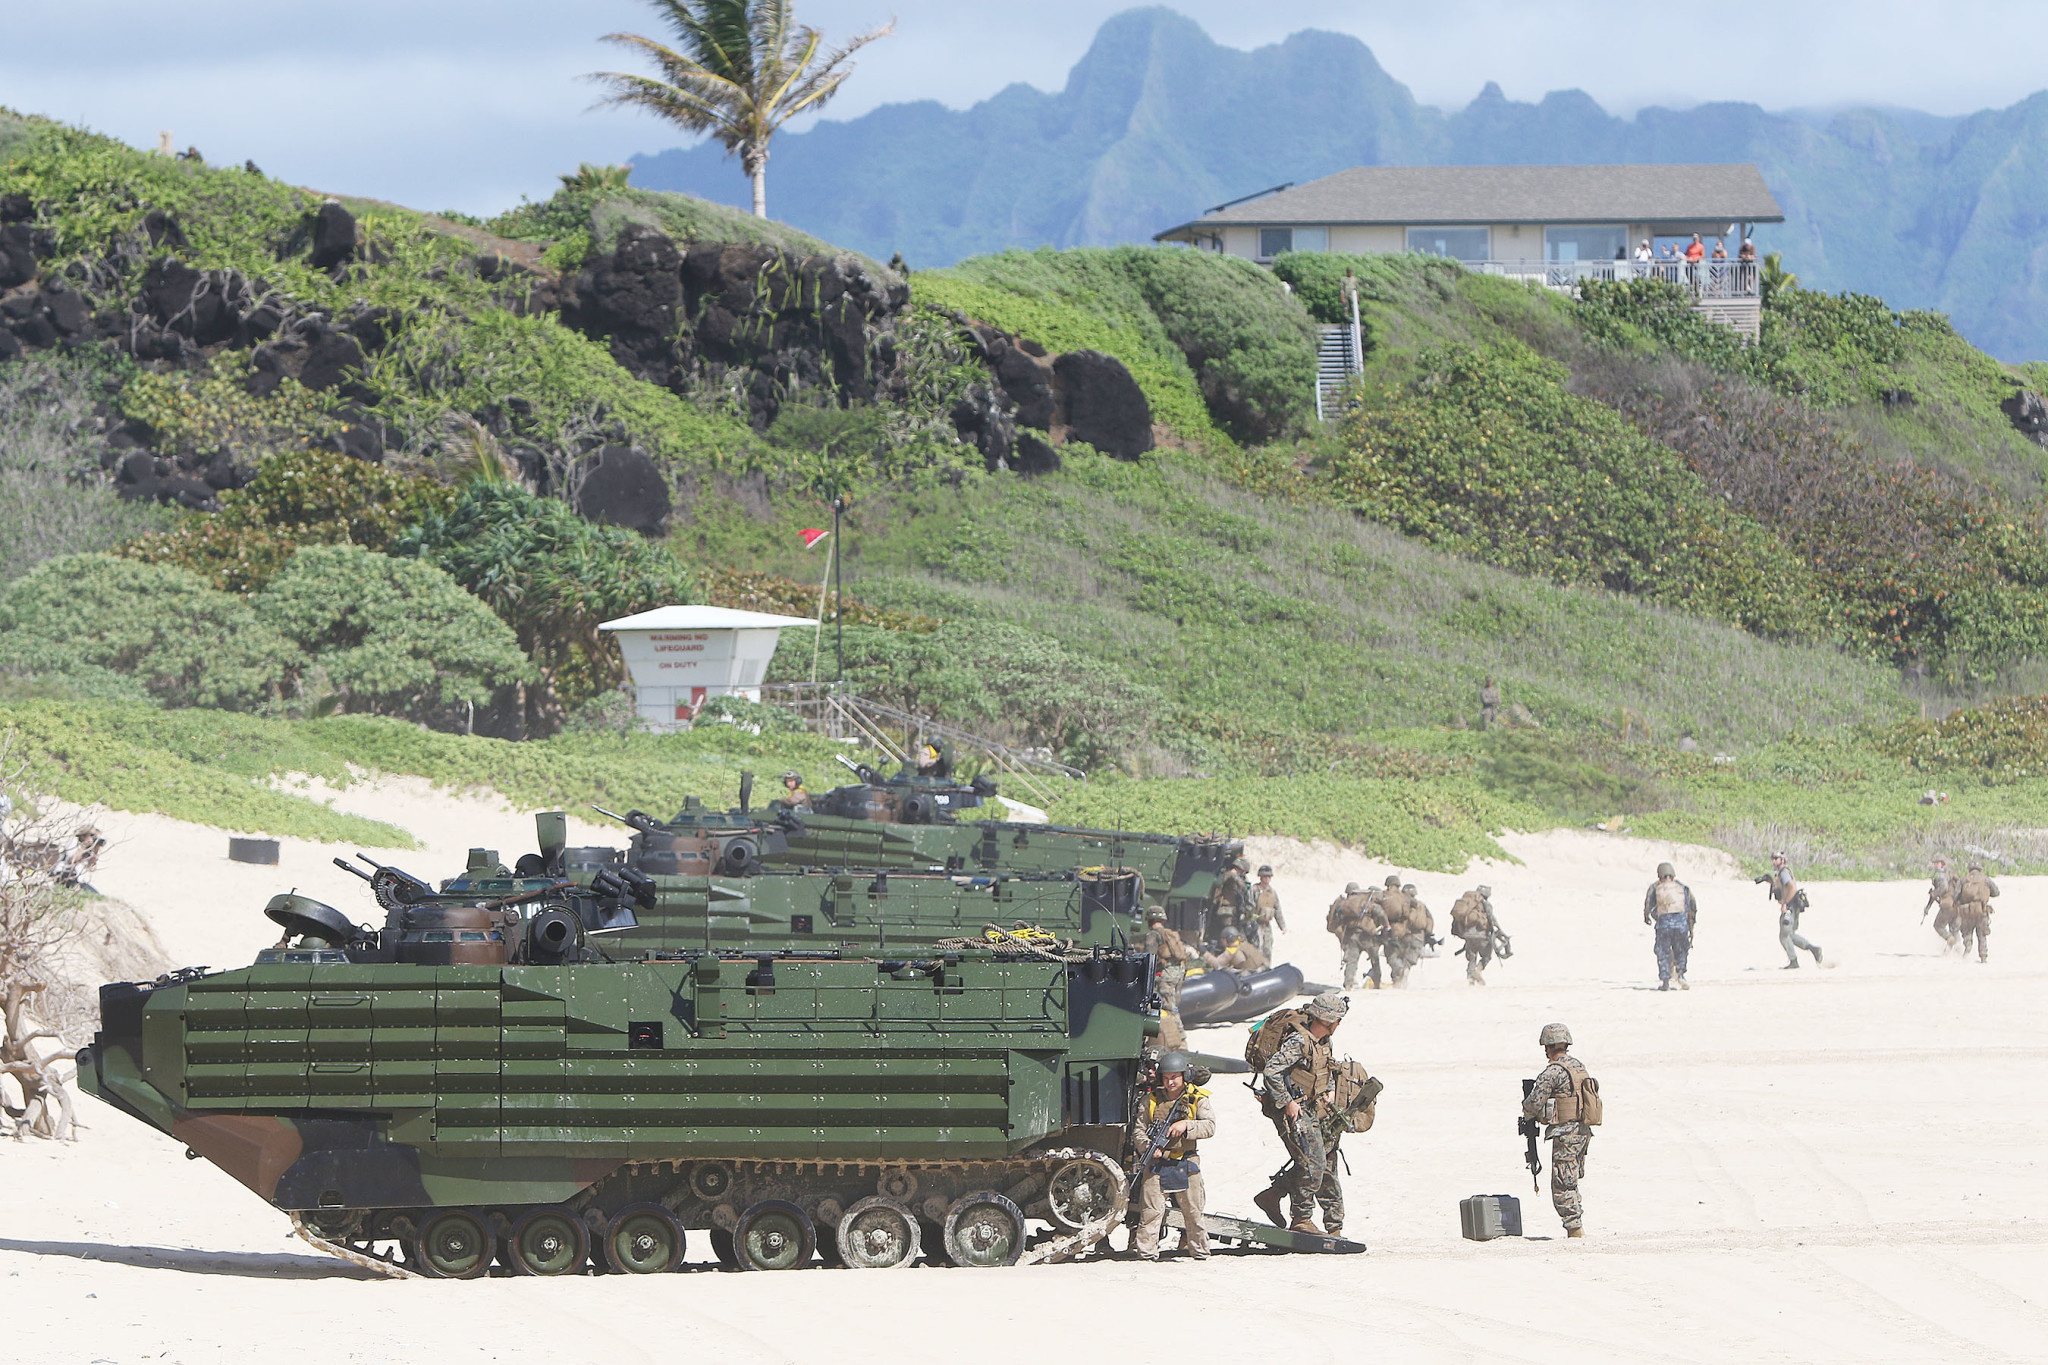 <p>The Provisional Marine Expeditionary Brigade-Hawaii wasmade up primarily of III Marine Expeditionary Force units based inHawaii.</p>